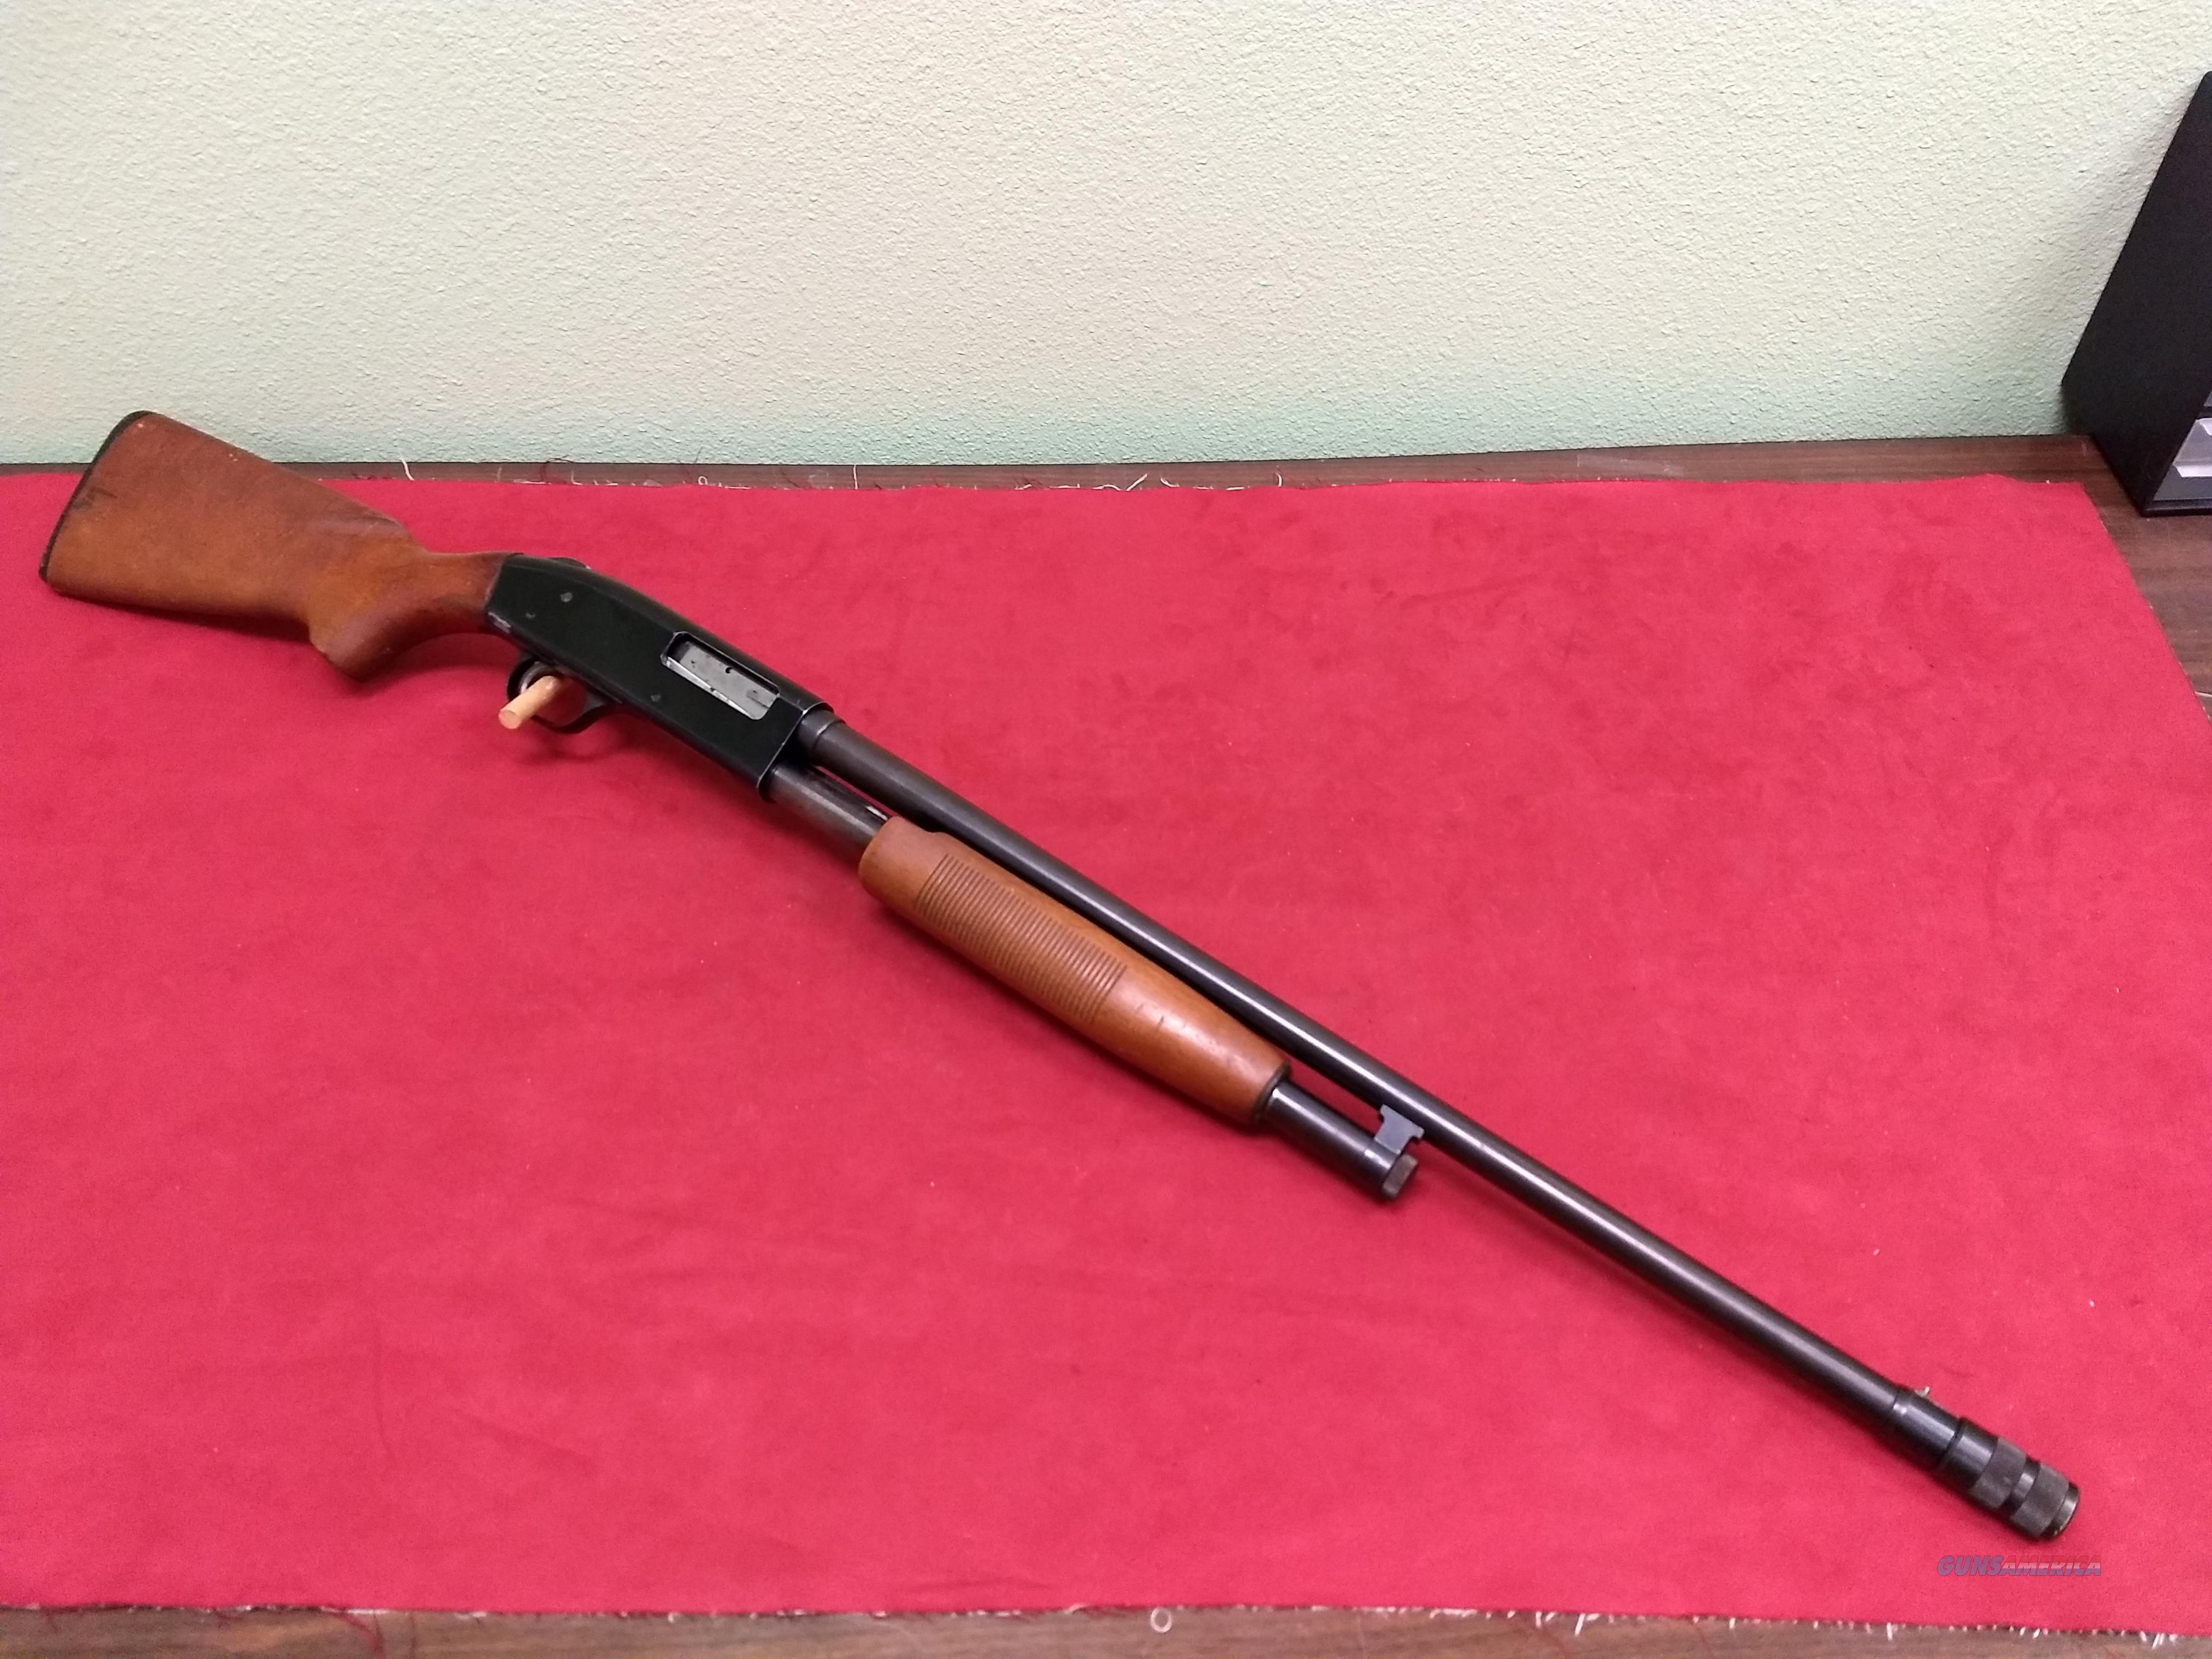 Mossberg 500CT Bantam Shotgun, 20 GA, Adjustable Choke  Guns > Shotguns > Mossberg Shotguns > Pump > Sporting